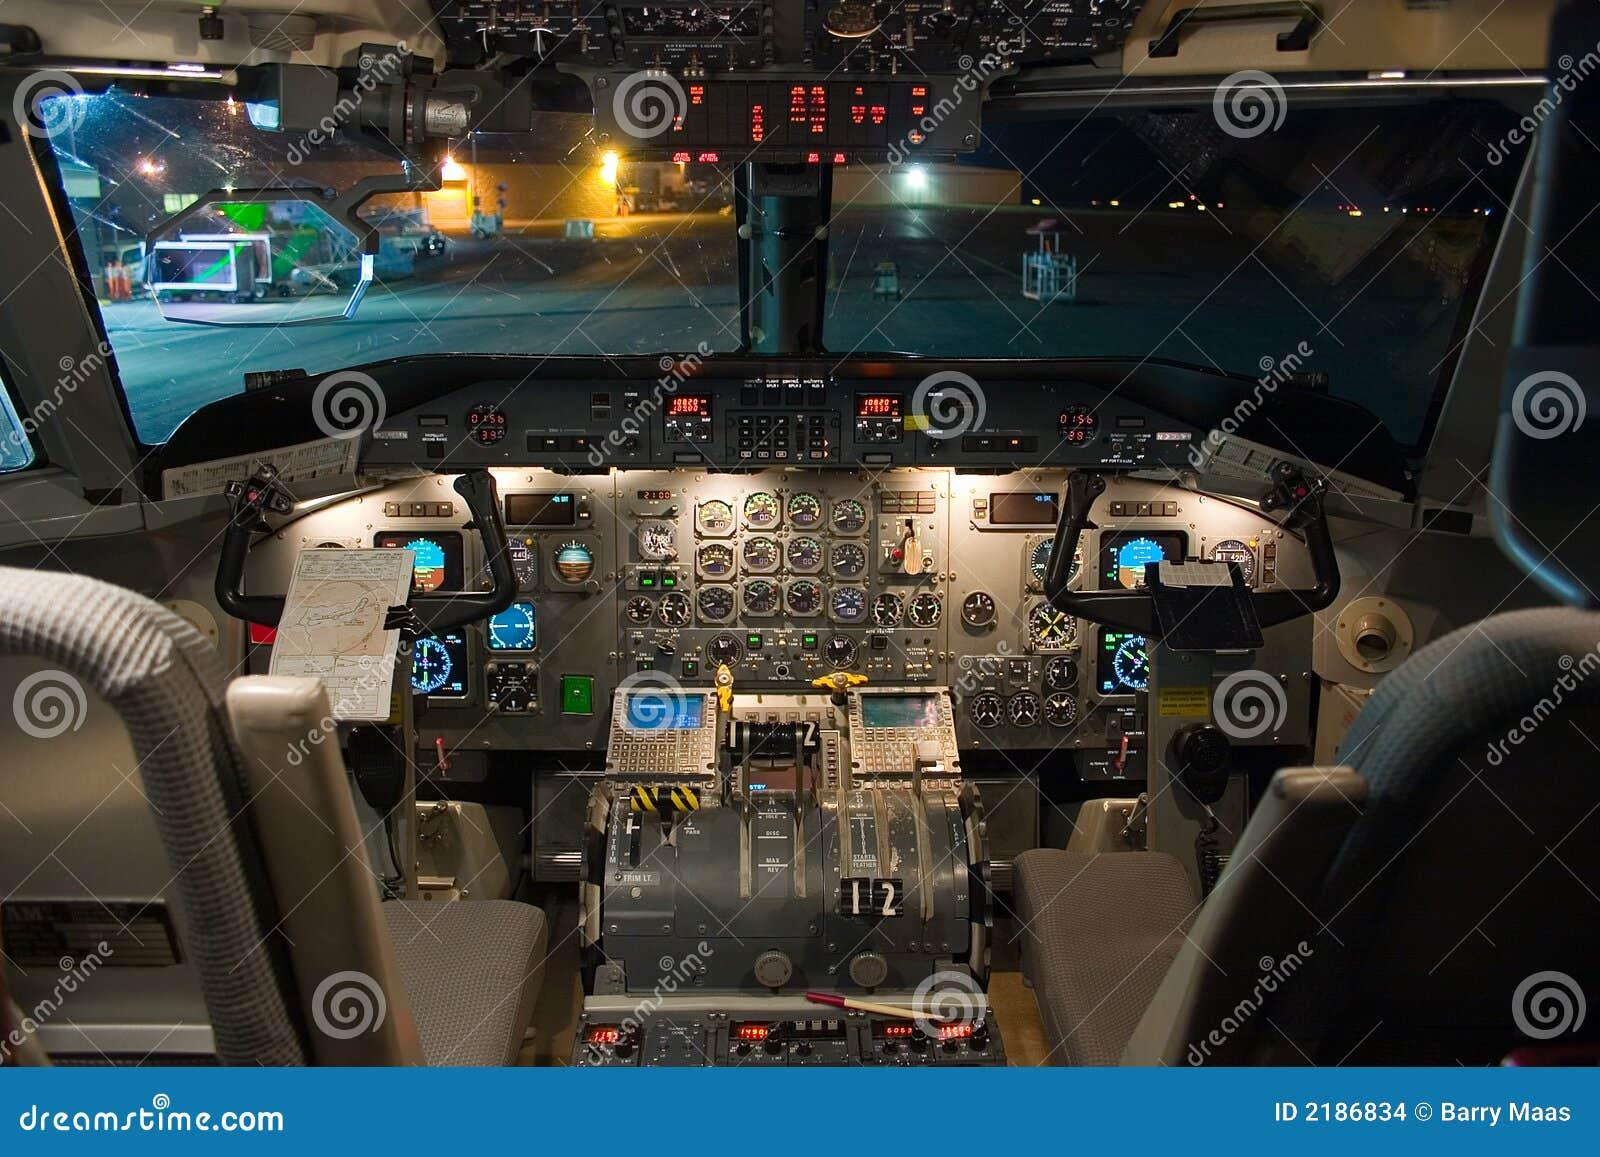 Dash 8 200 Flight Deck Stock Images Image 2186834